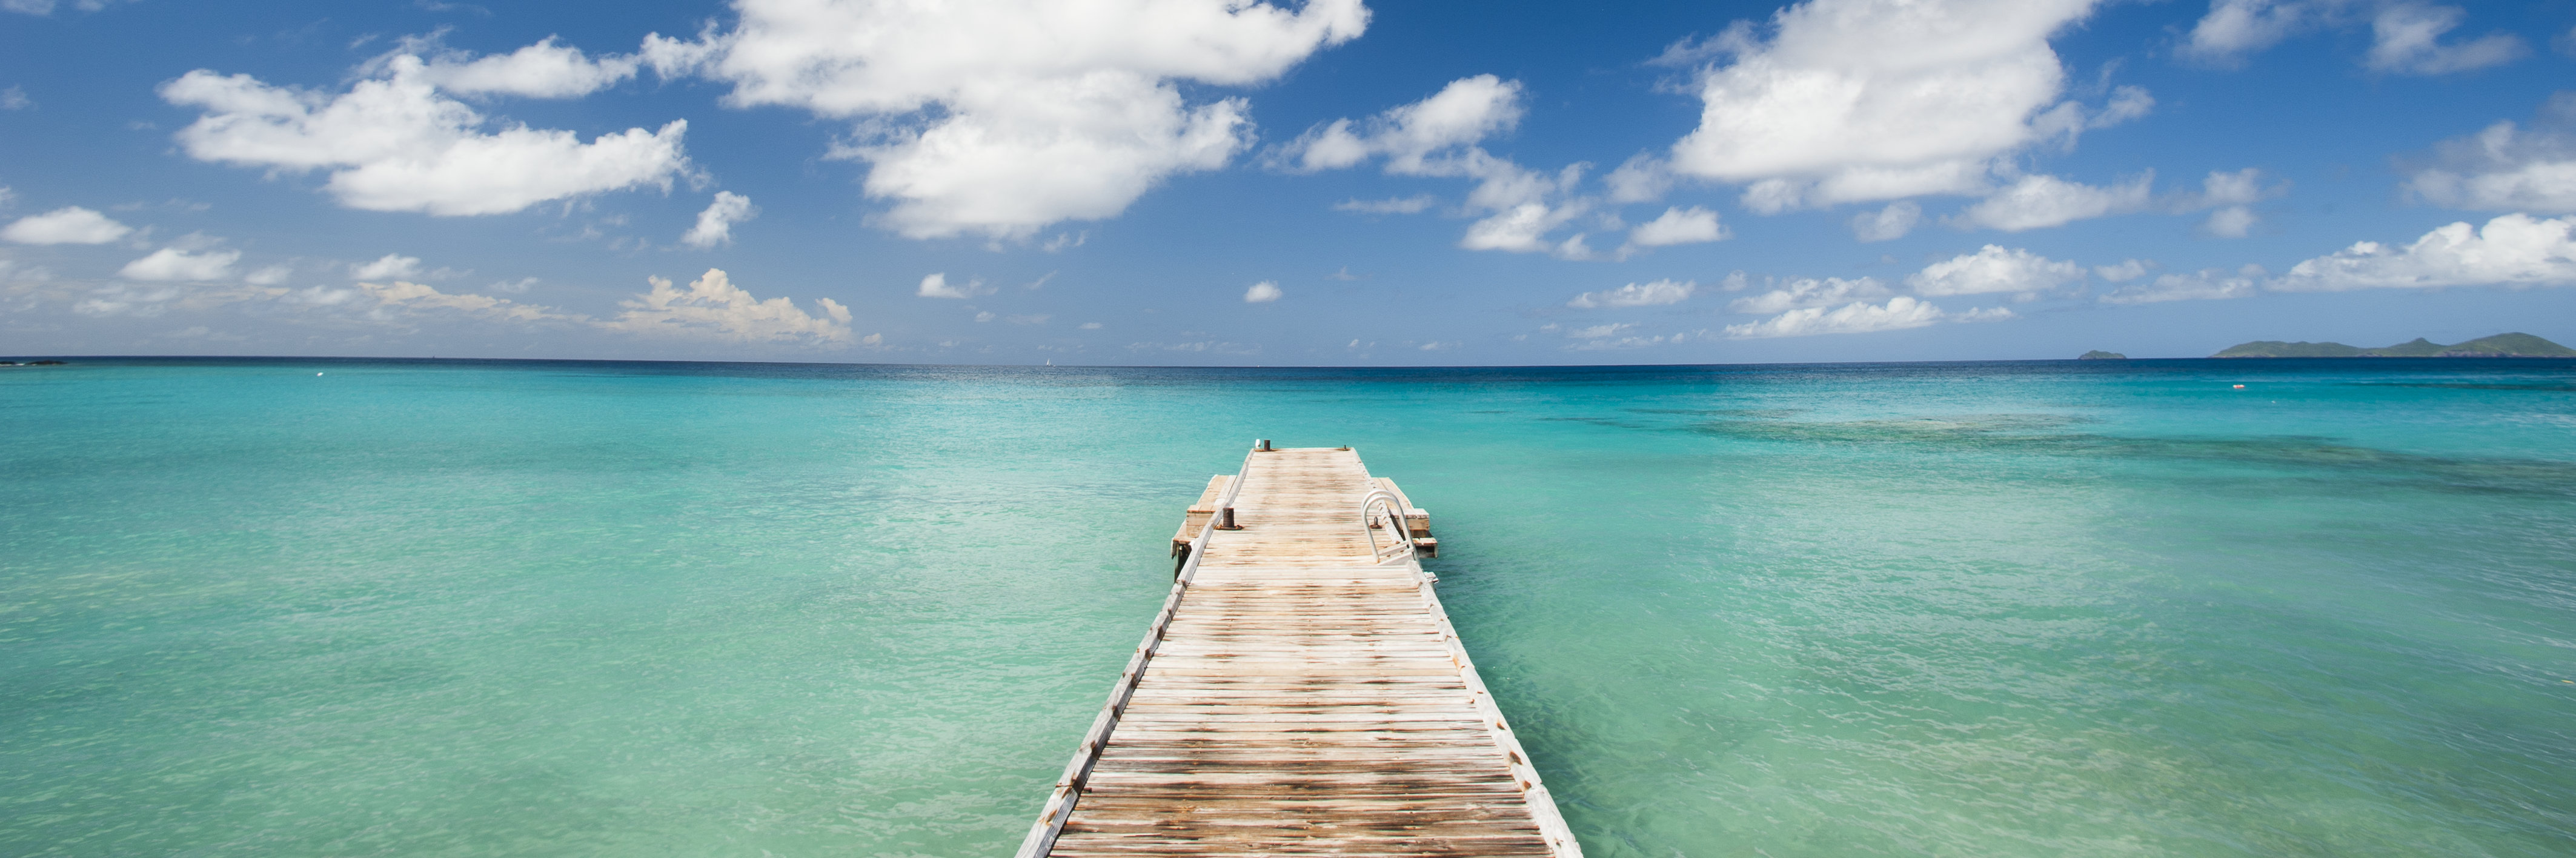 travel-concierge-caribbean